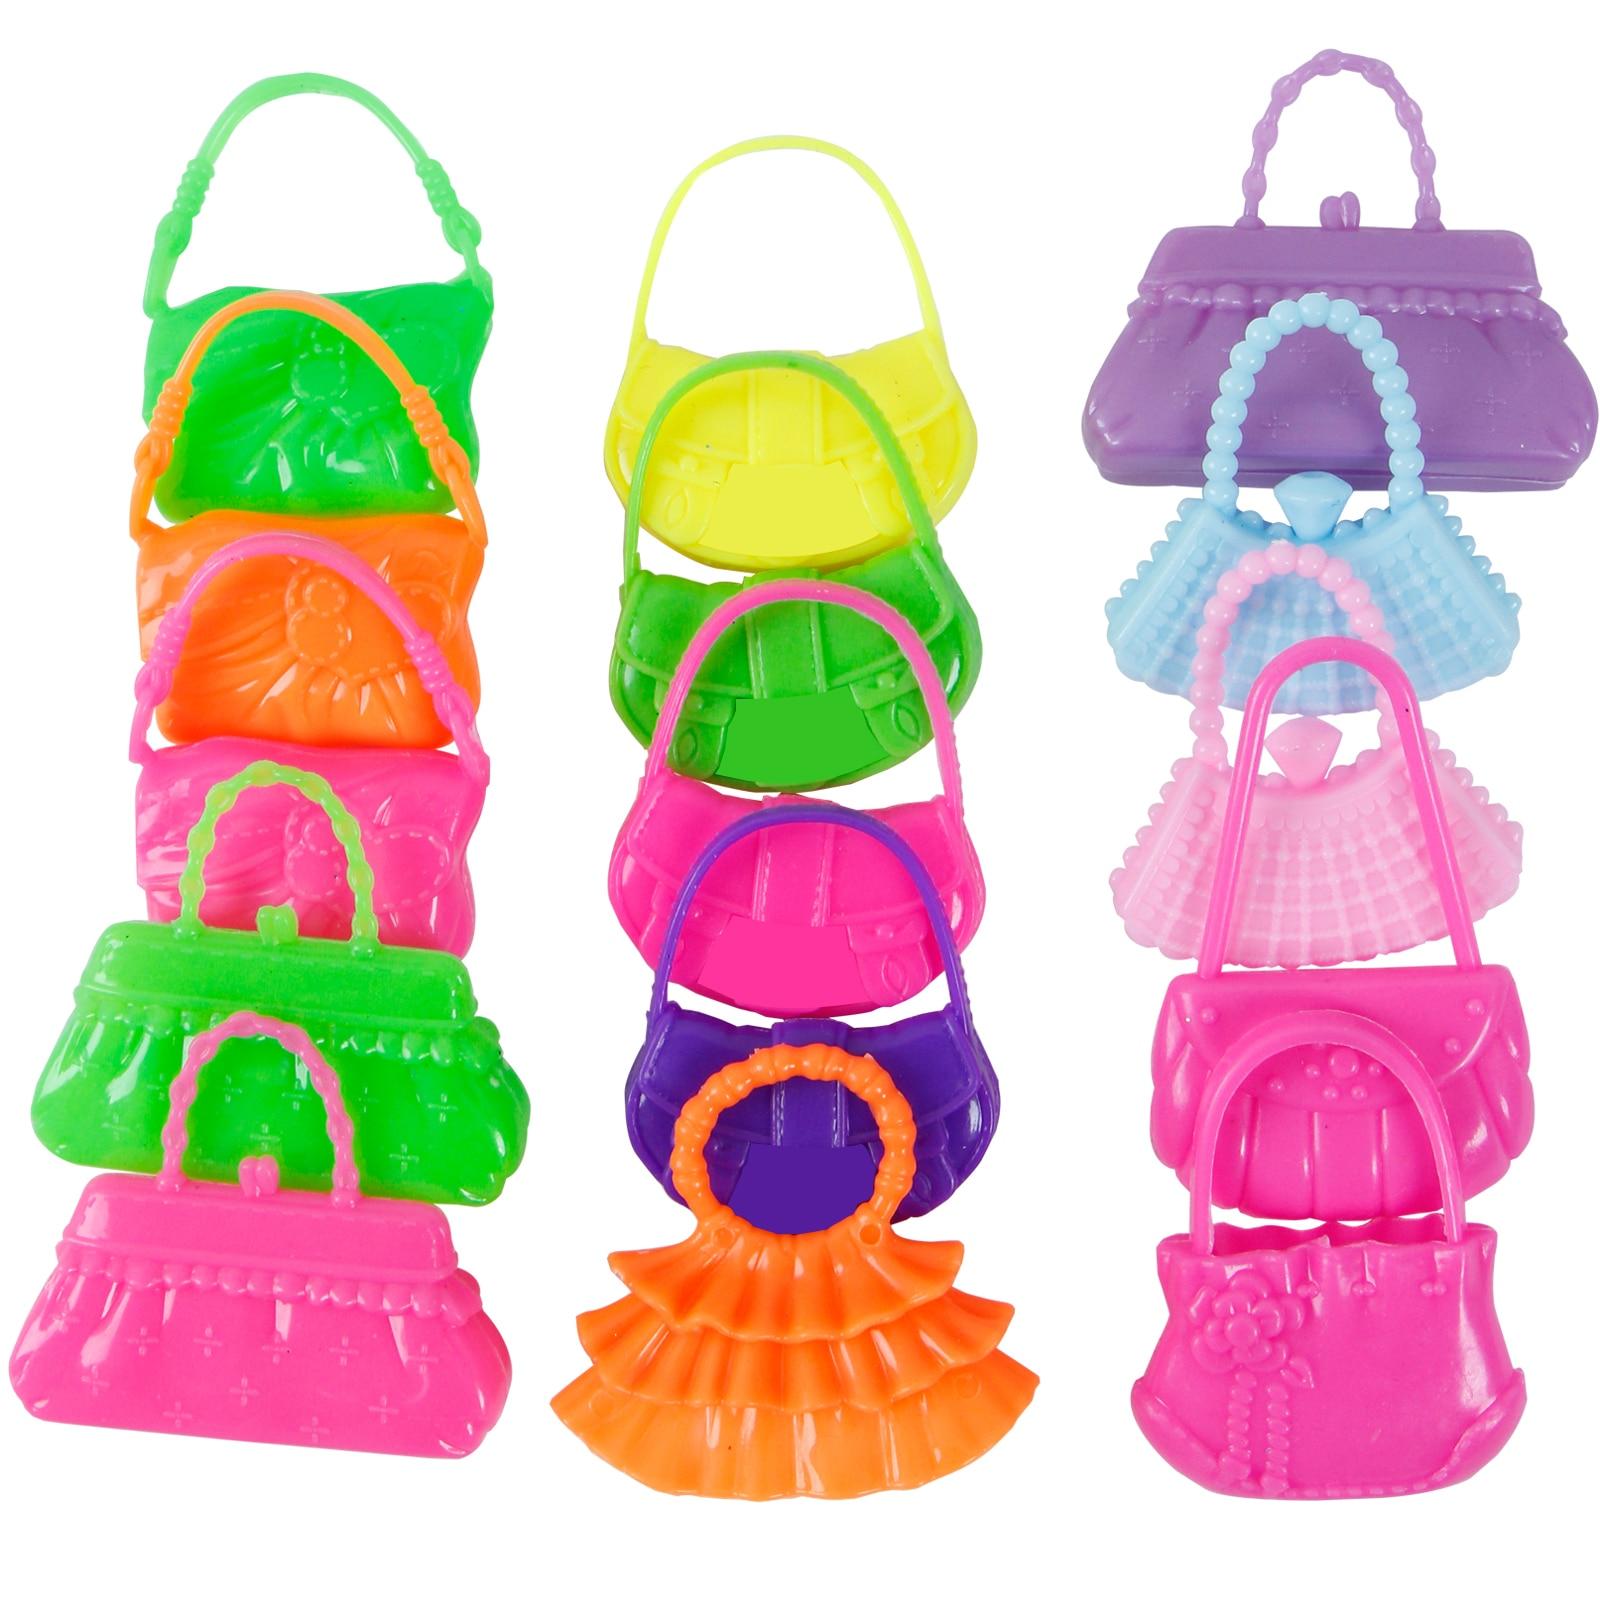 AMETUS 32 PCS Doll Accessories 10x Mix Cute Dresses 6X 4X Glasses 10x Shoes